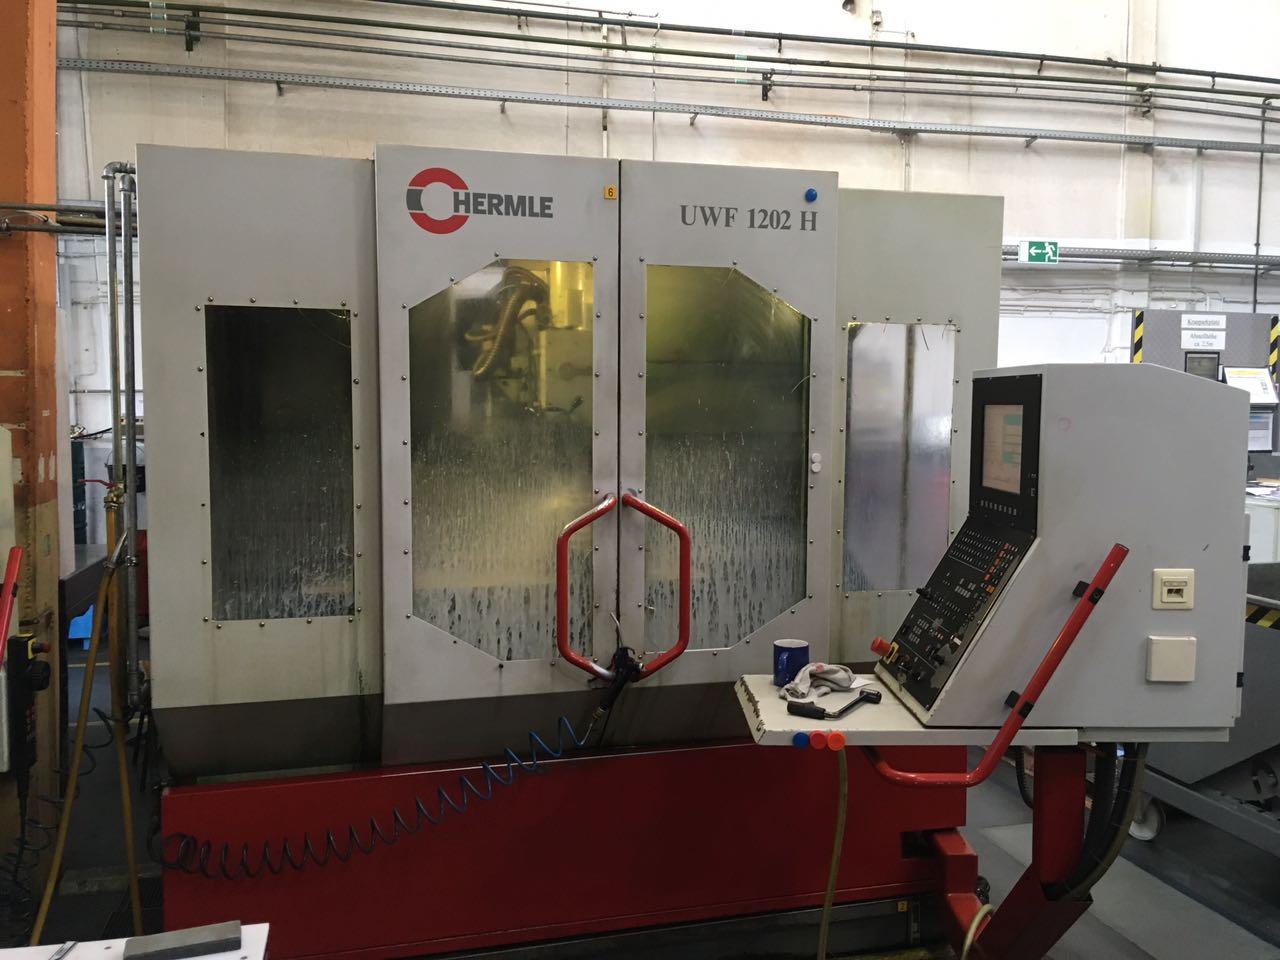 gebrauchte Maschinen sofort verfügbar Bearbeitungszentrum HERMLE UWF 1202H